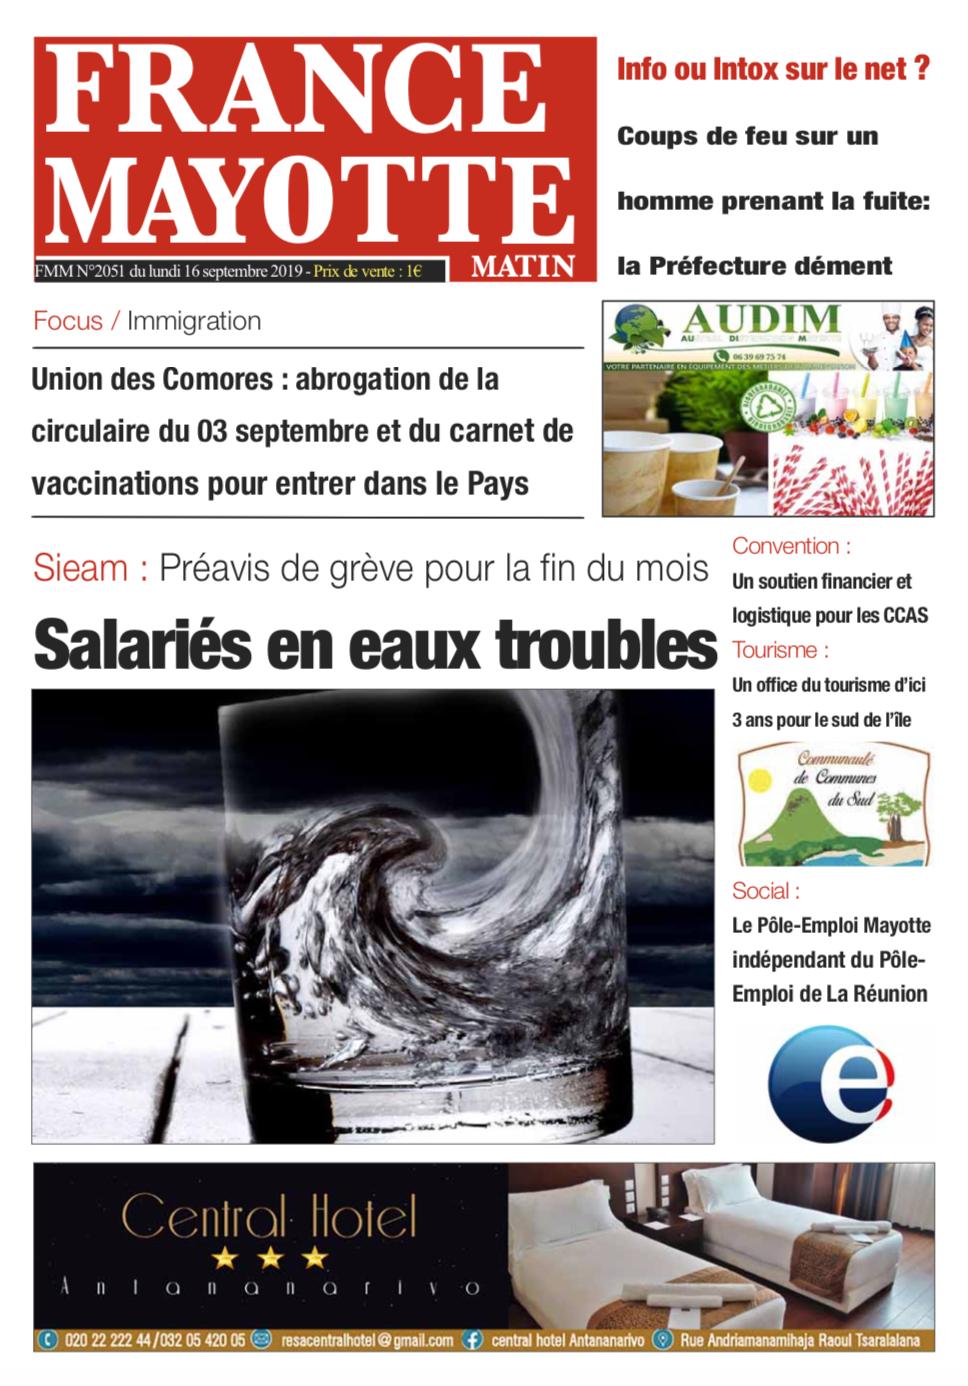 France Mayotte Lundi 16 septembre 2019